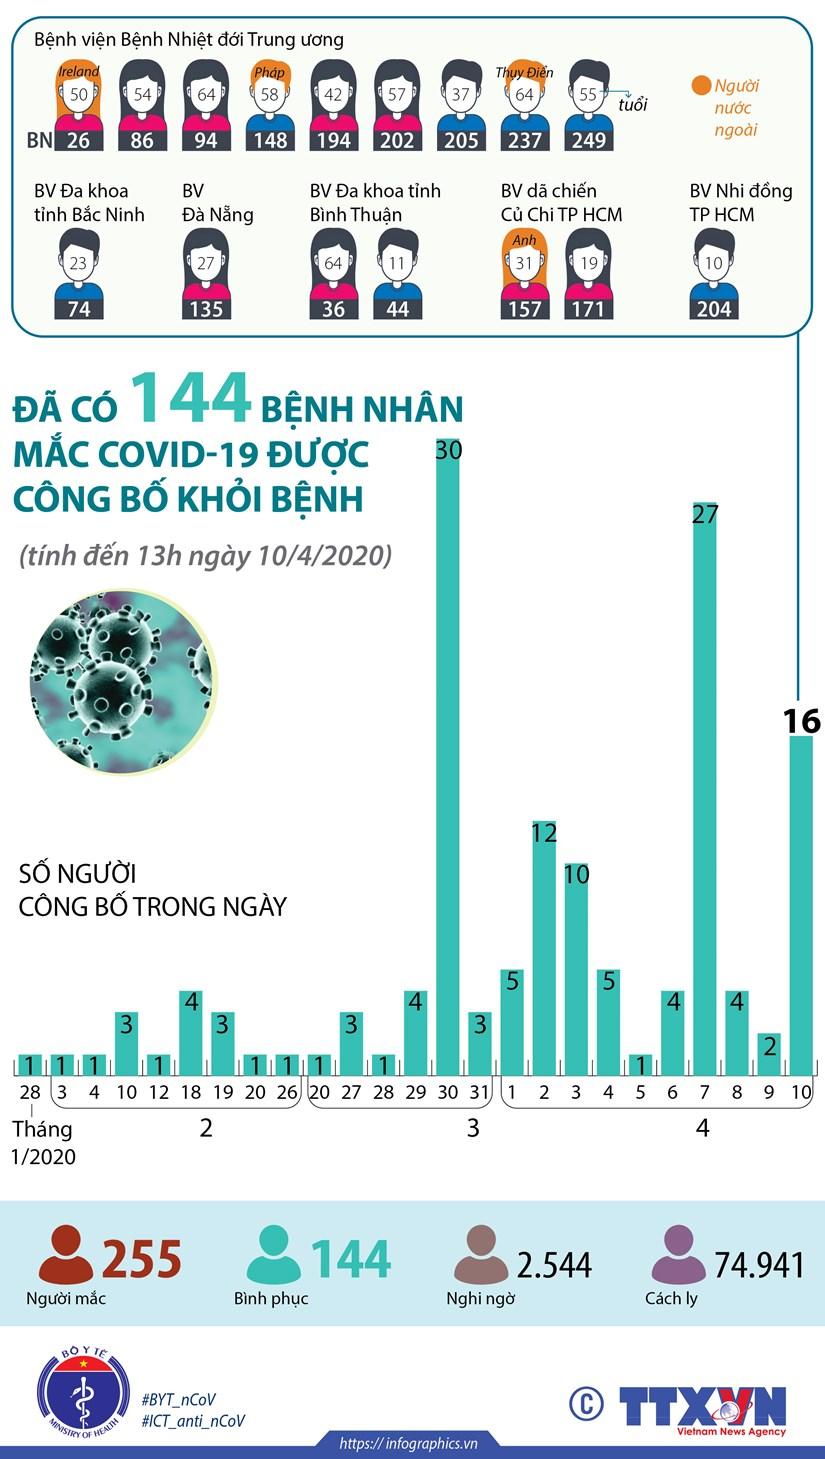 [Infographics] Da co 144 benh nhan mac COVID-19 duoc cong bo khoi benh hinh anh 1